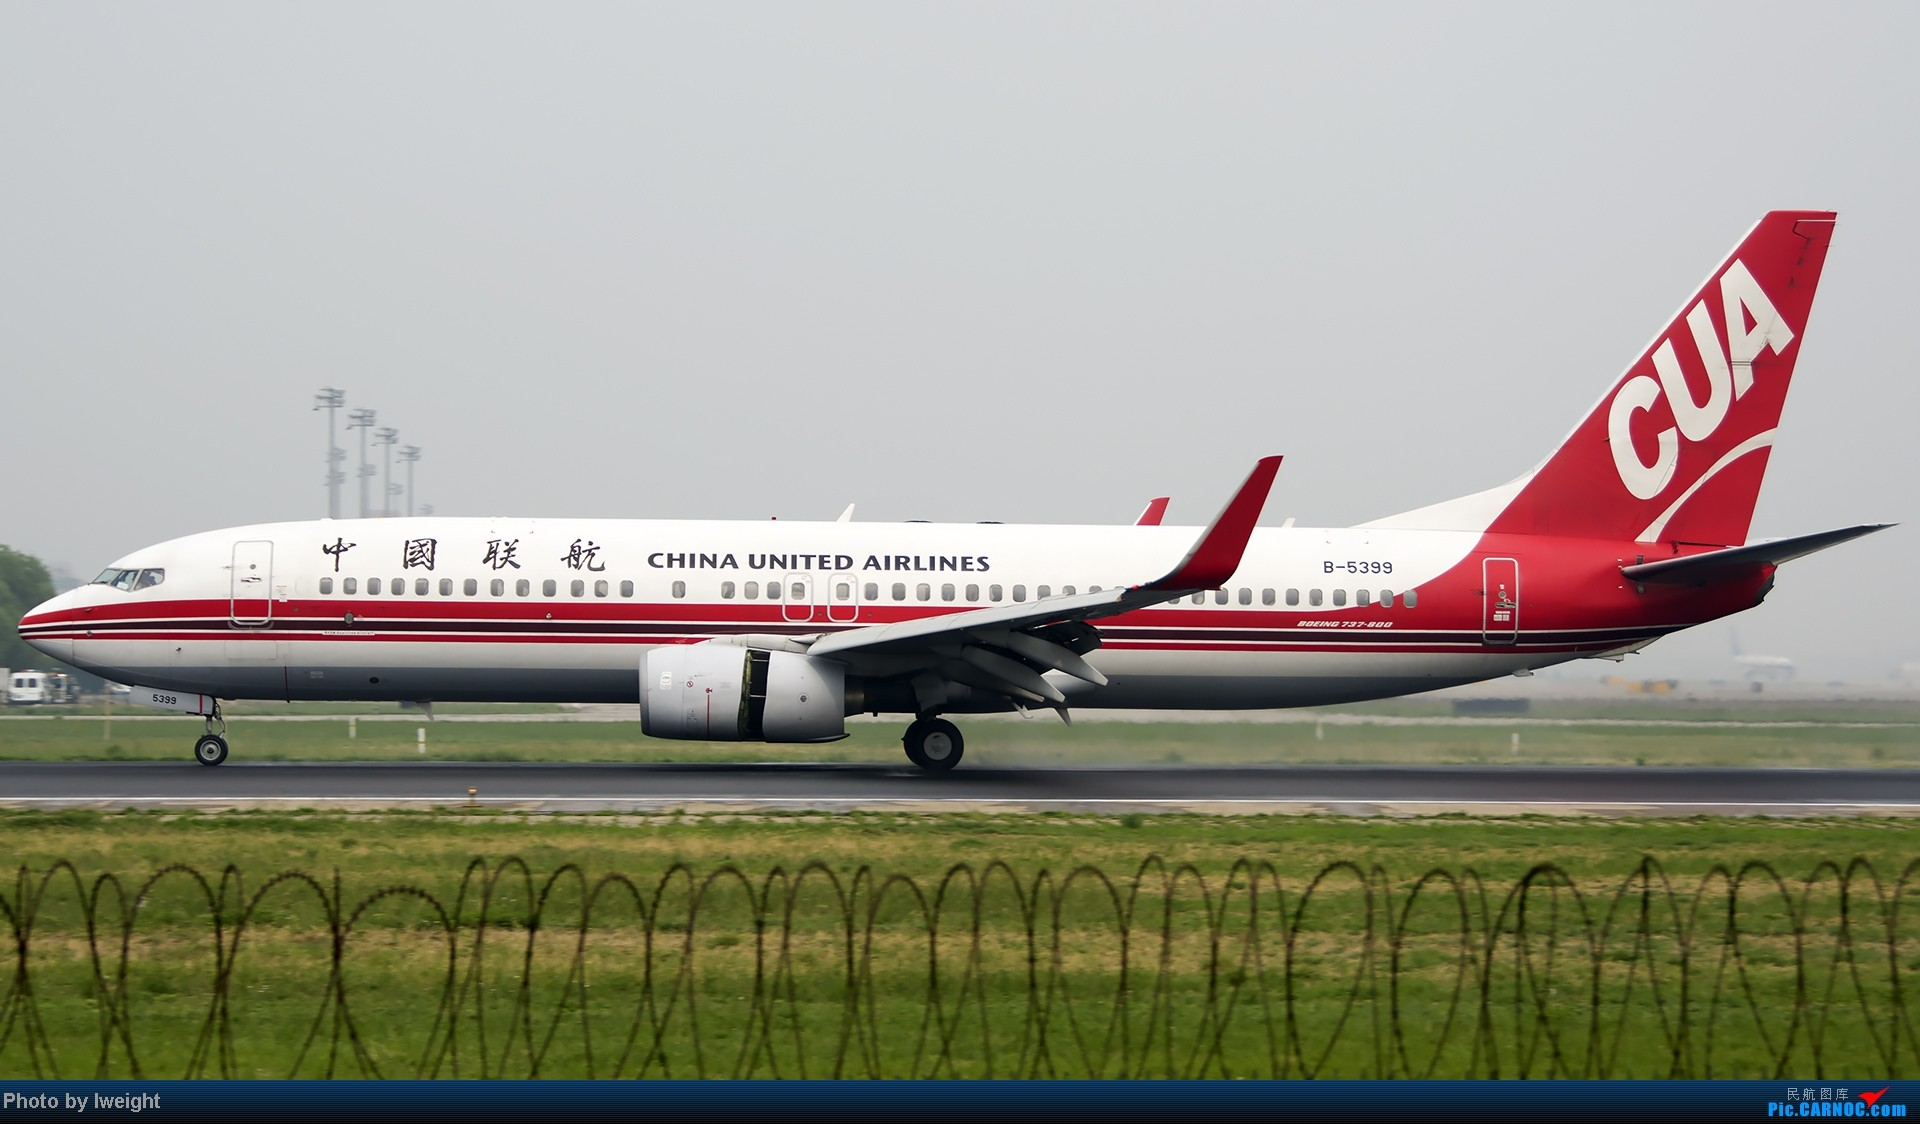 Re:[原创]休假无聊,跑道边来拍机玩(晚点的ZestAir、换装的B6100和刚交付的B2738等) BOEING 737-800 B-5399 中国北京首都机场